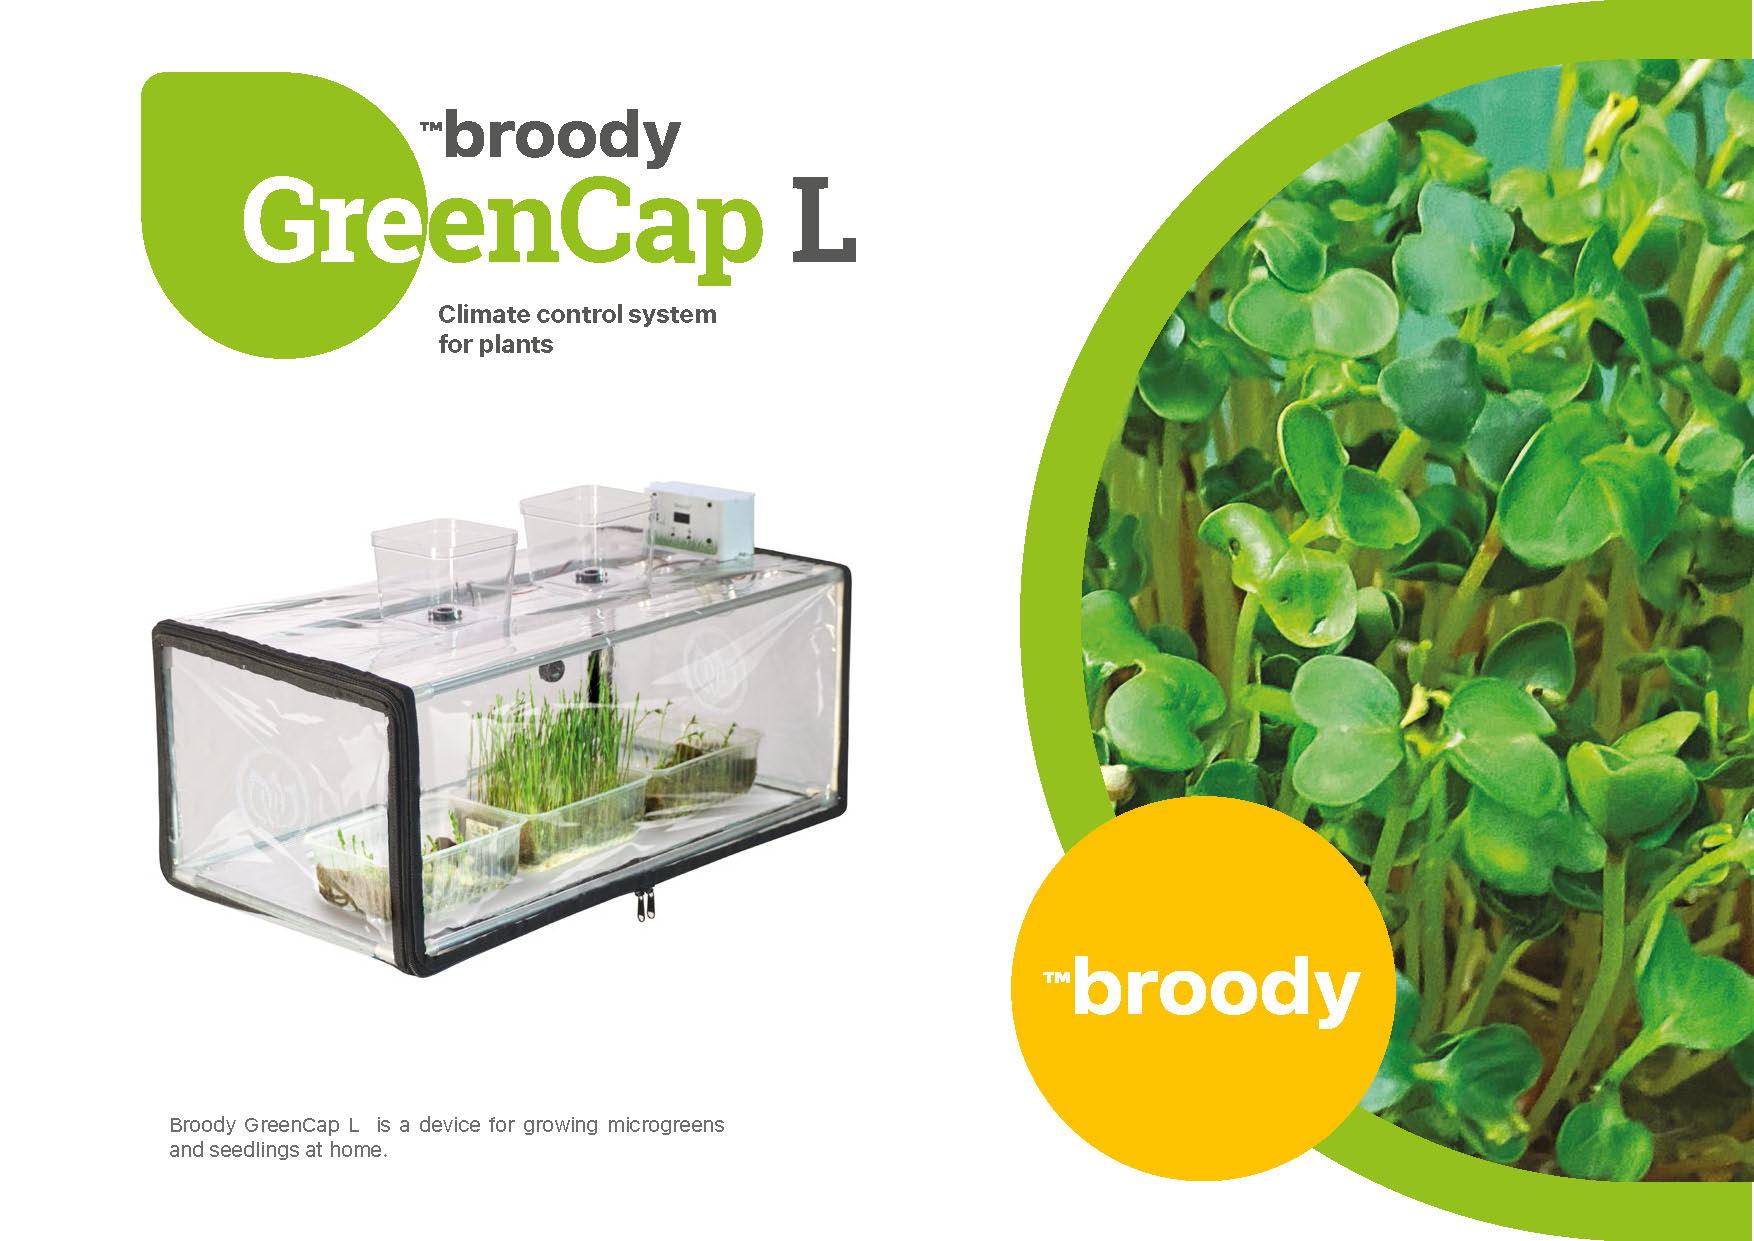 GreenCap_Plant propagator with light